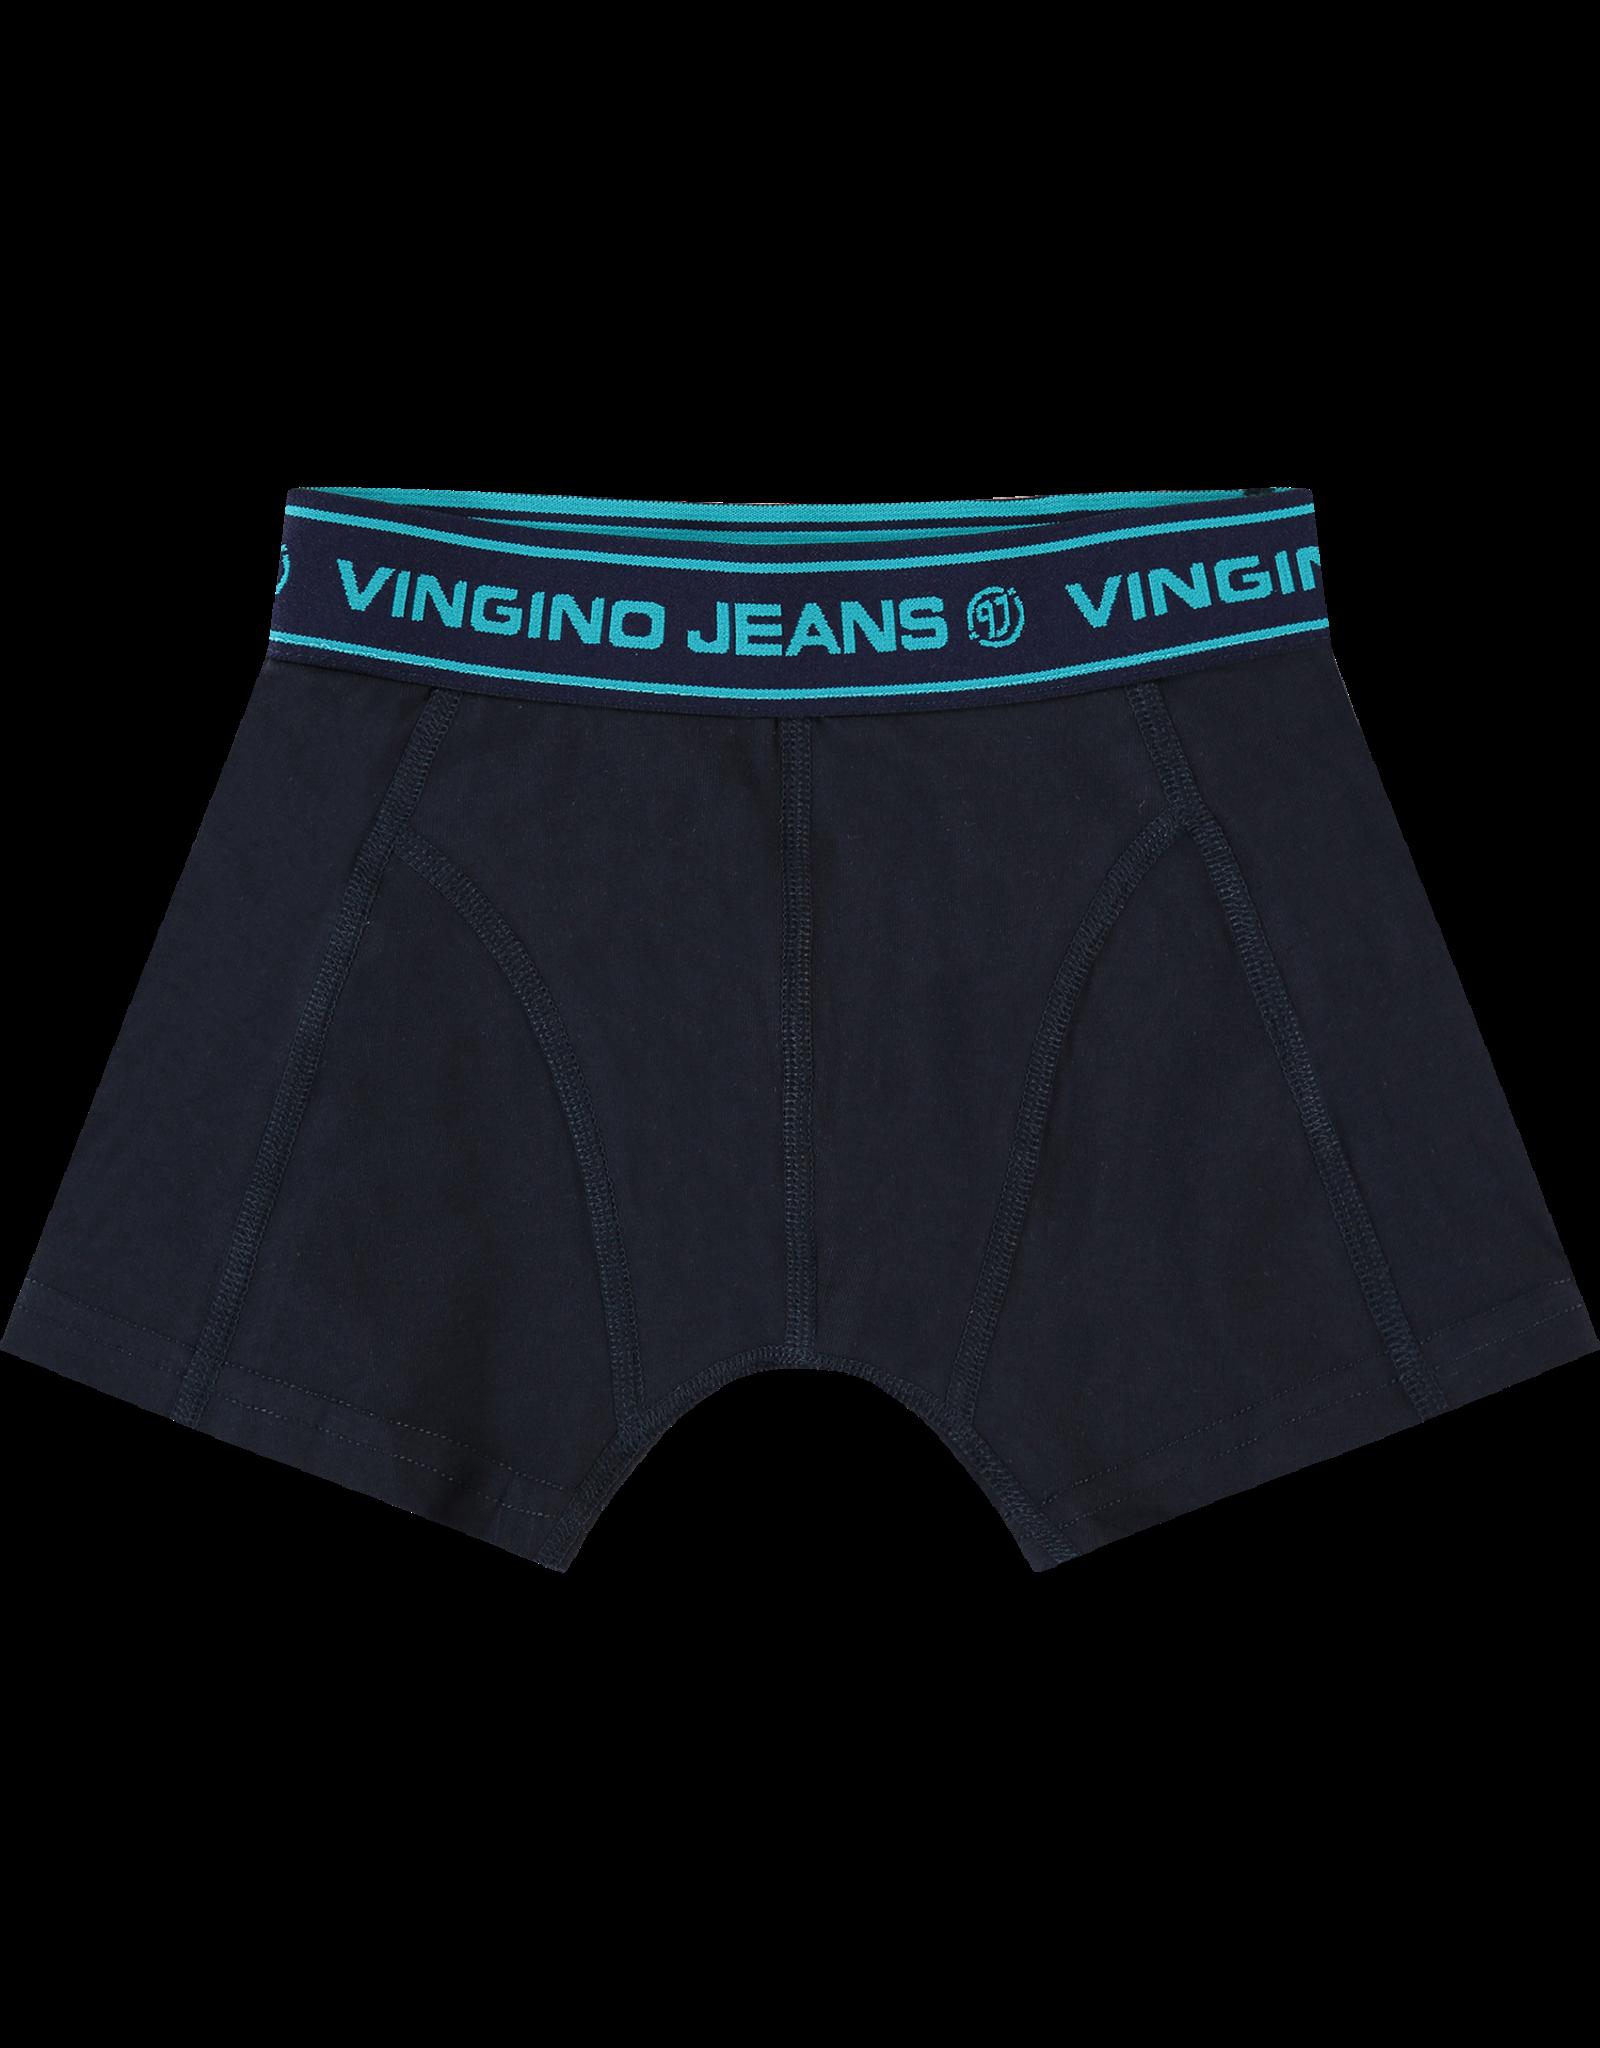 Vingino B-213-7 VINGINO LOGO 1012 Ultra blue